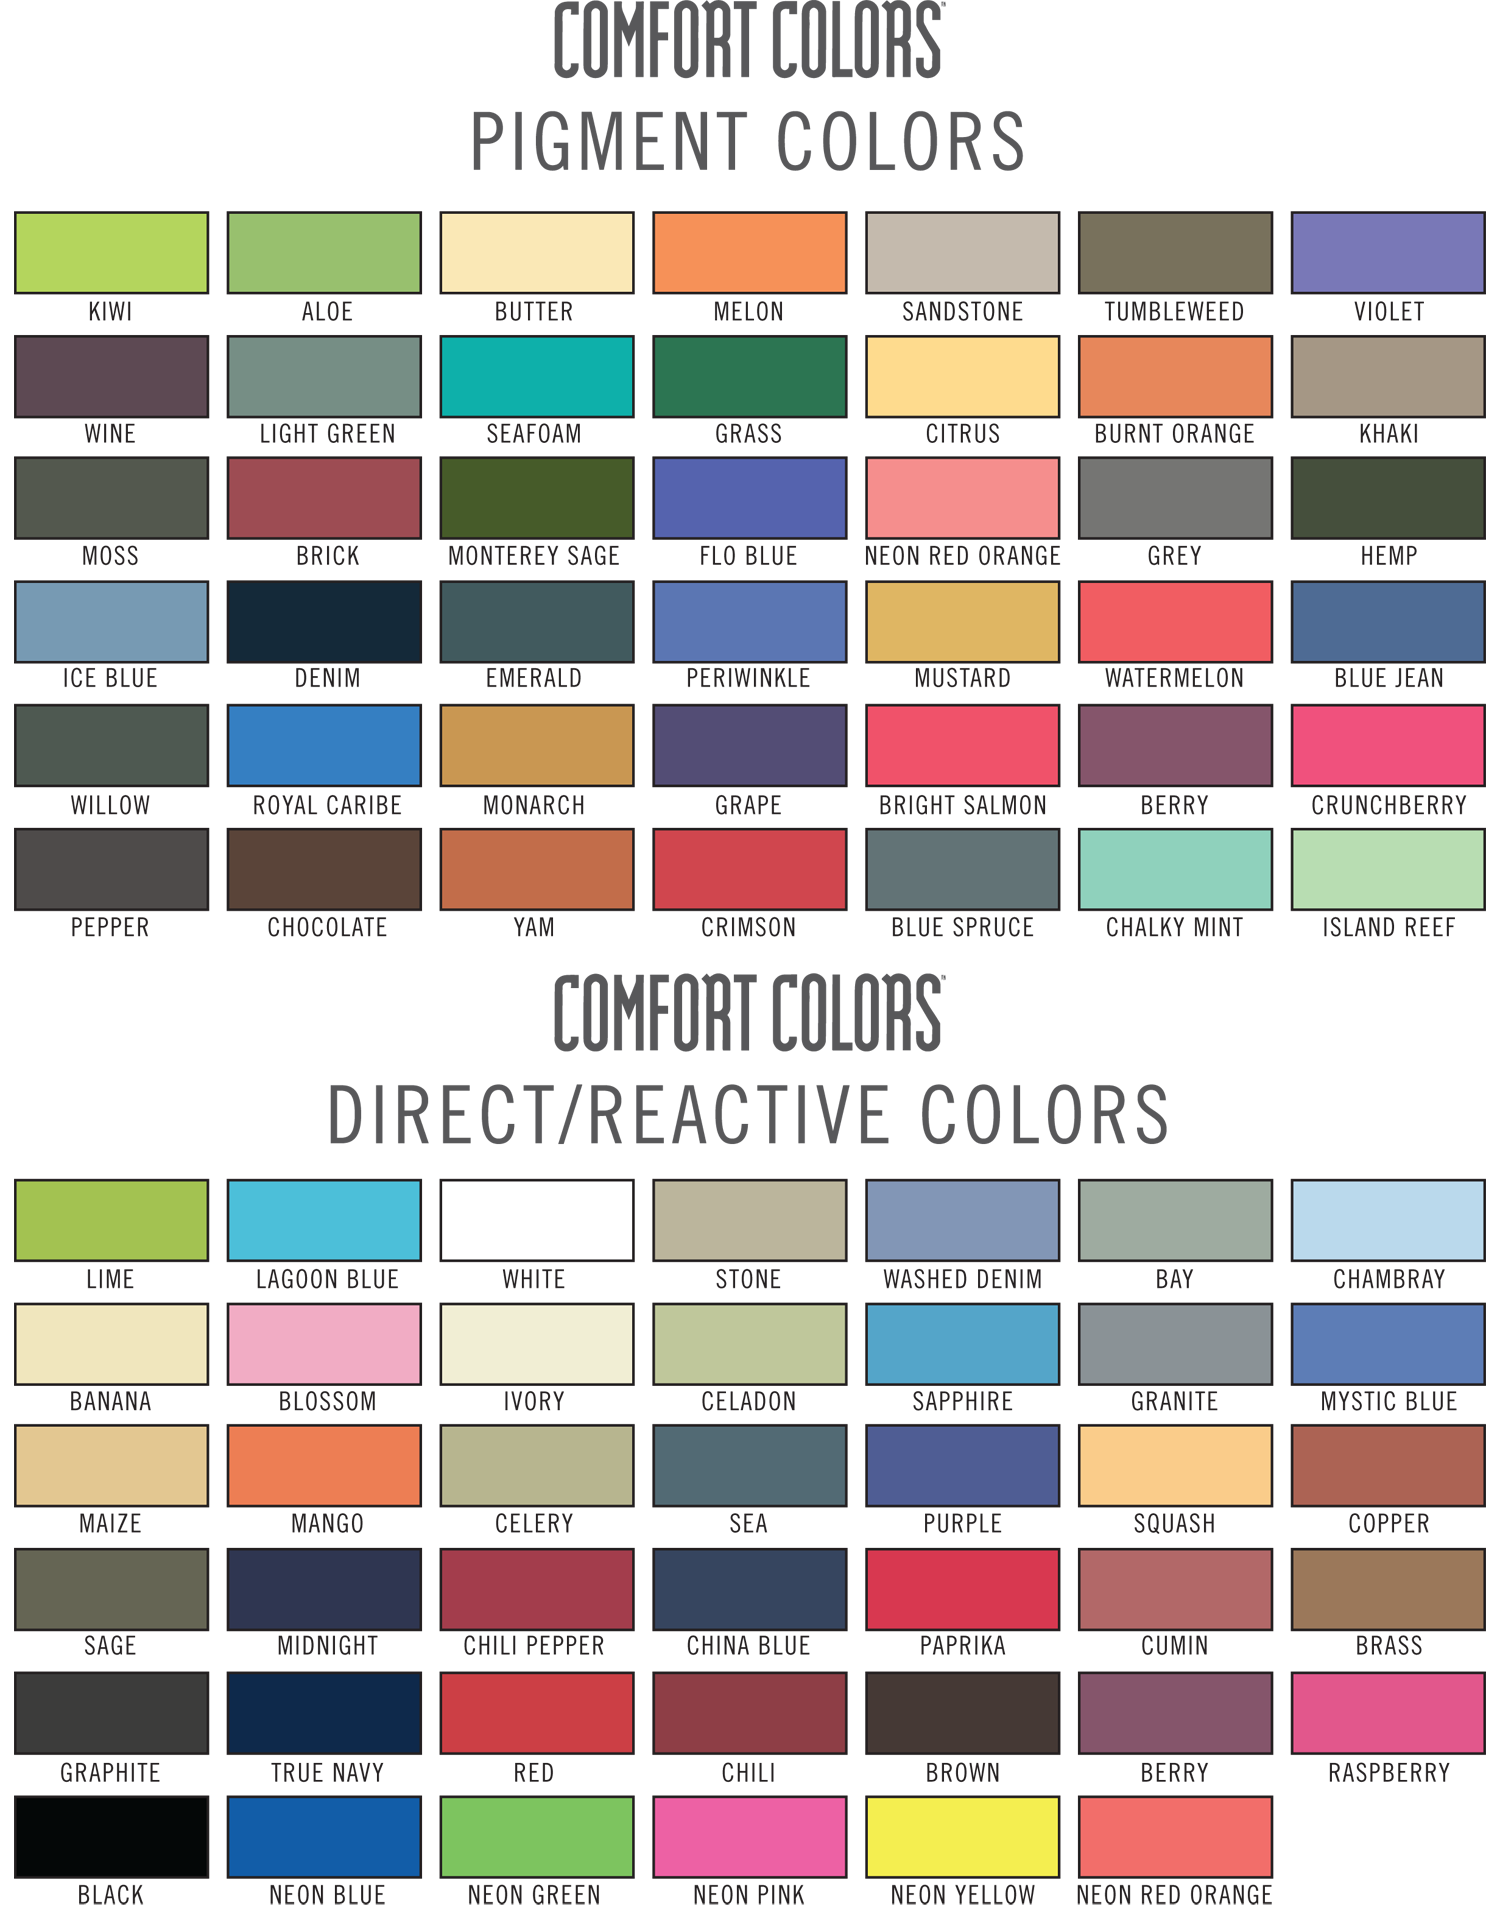 Comfort colors color chart 2014 comfort colors color chart comfort colors color chart 2014 comfort colors color chart sweatshirts comfort color t shirt ratelco nvjuhfo Gallery